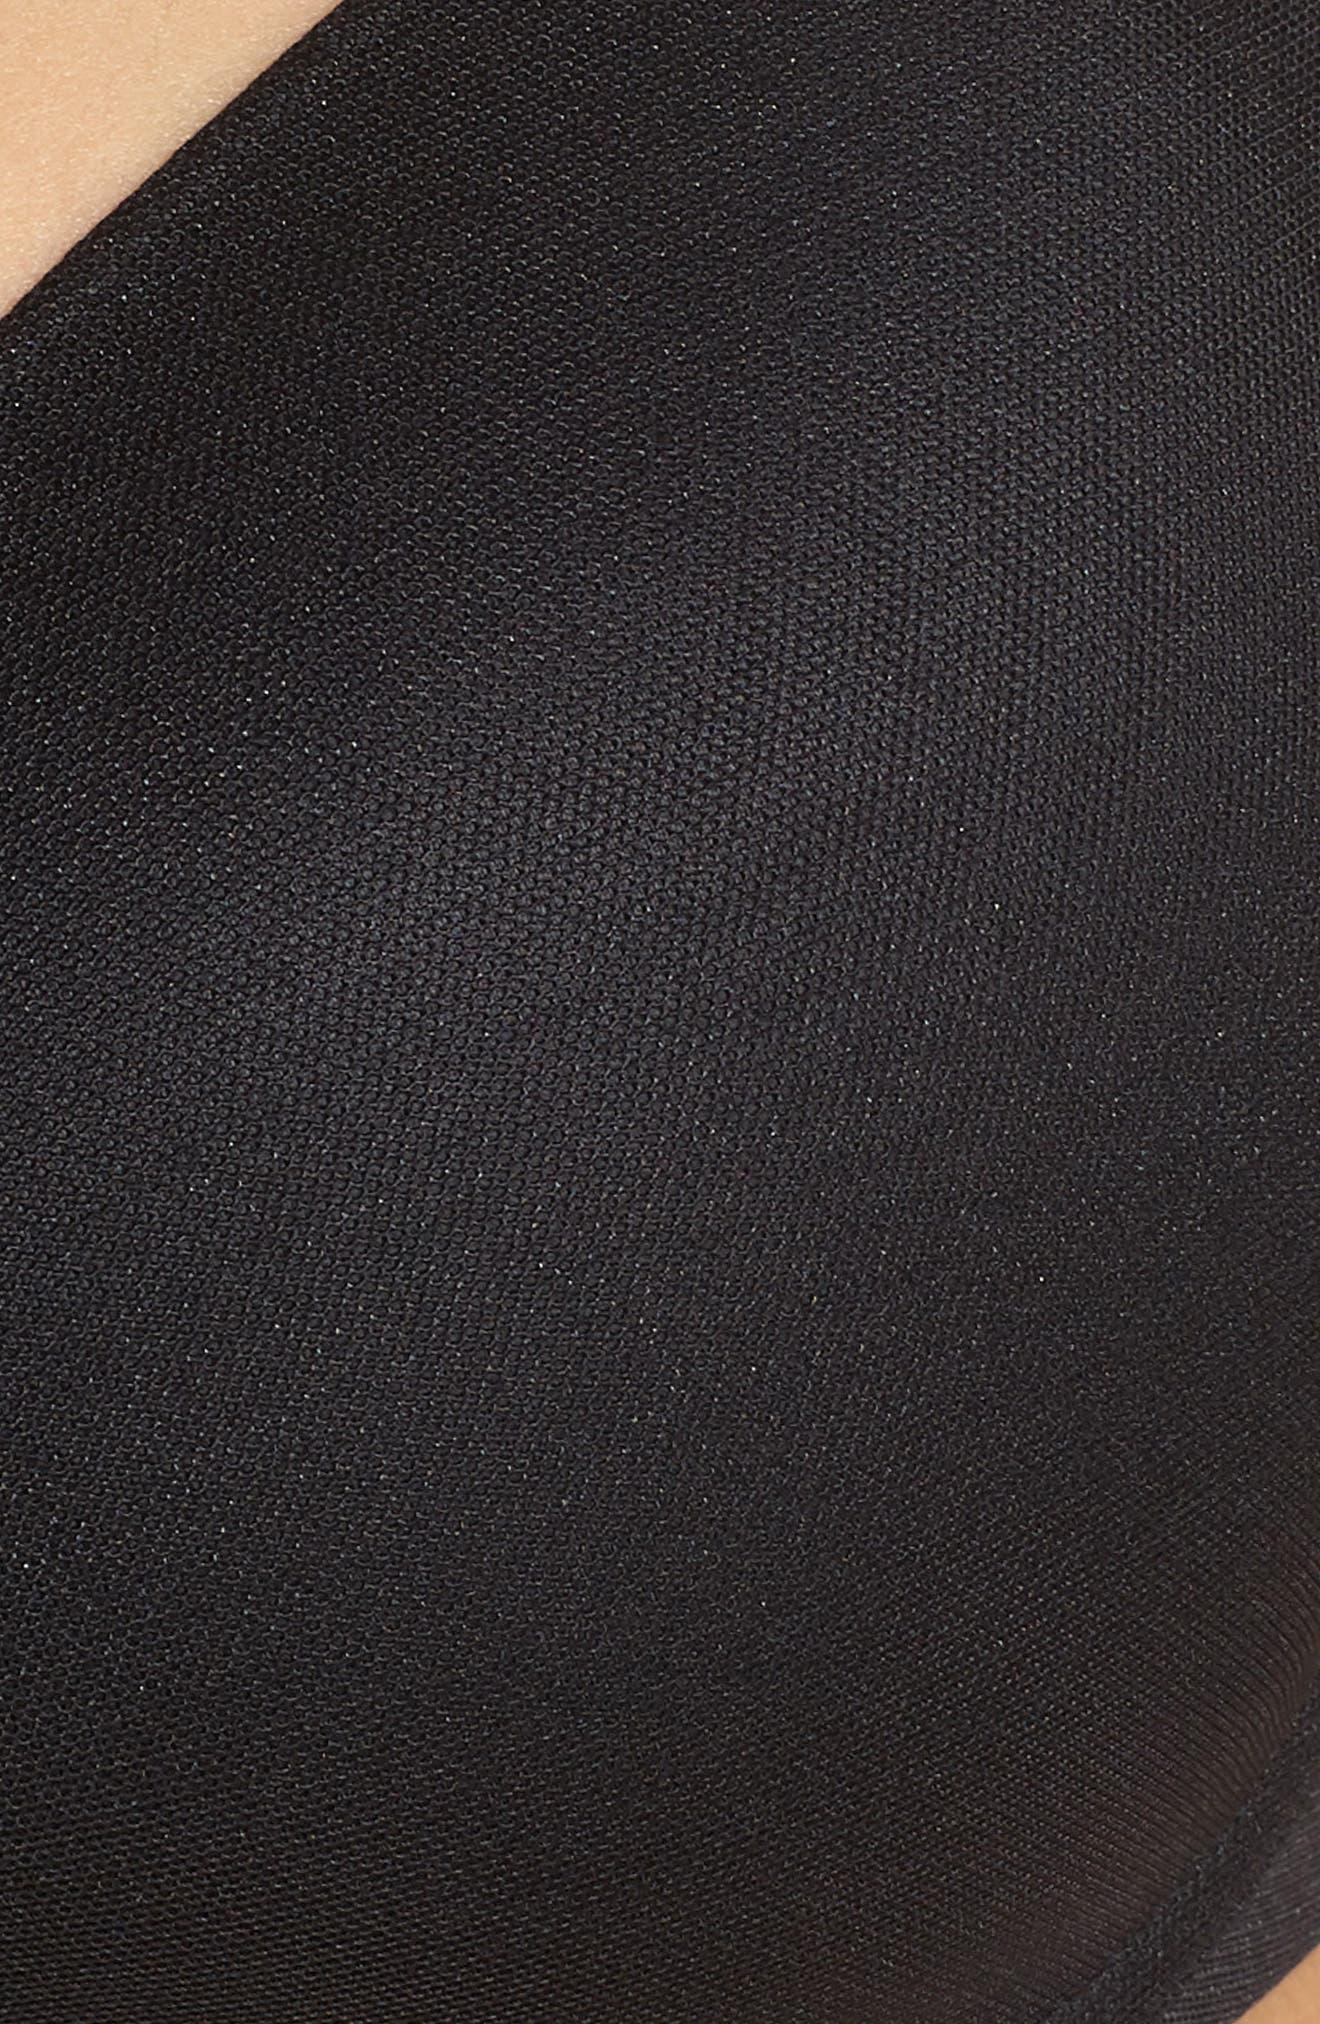 CHANTELLE LINGERIE, Smooth Full Coverage Underwire T-Shirt Bra, Alternate thumbnail 7, color, BLACK